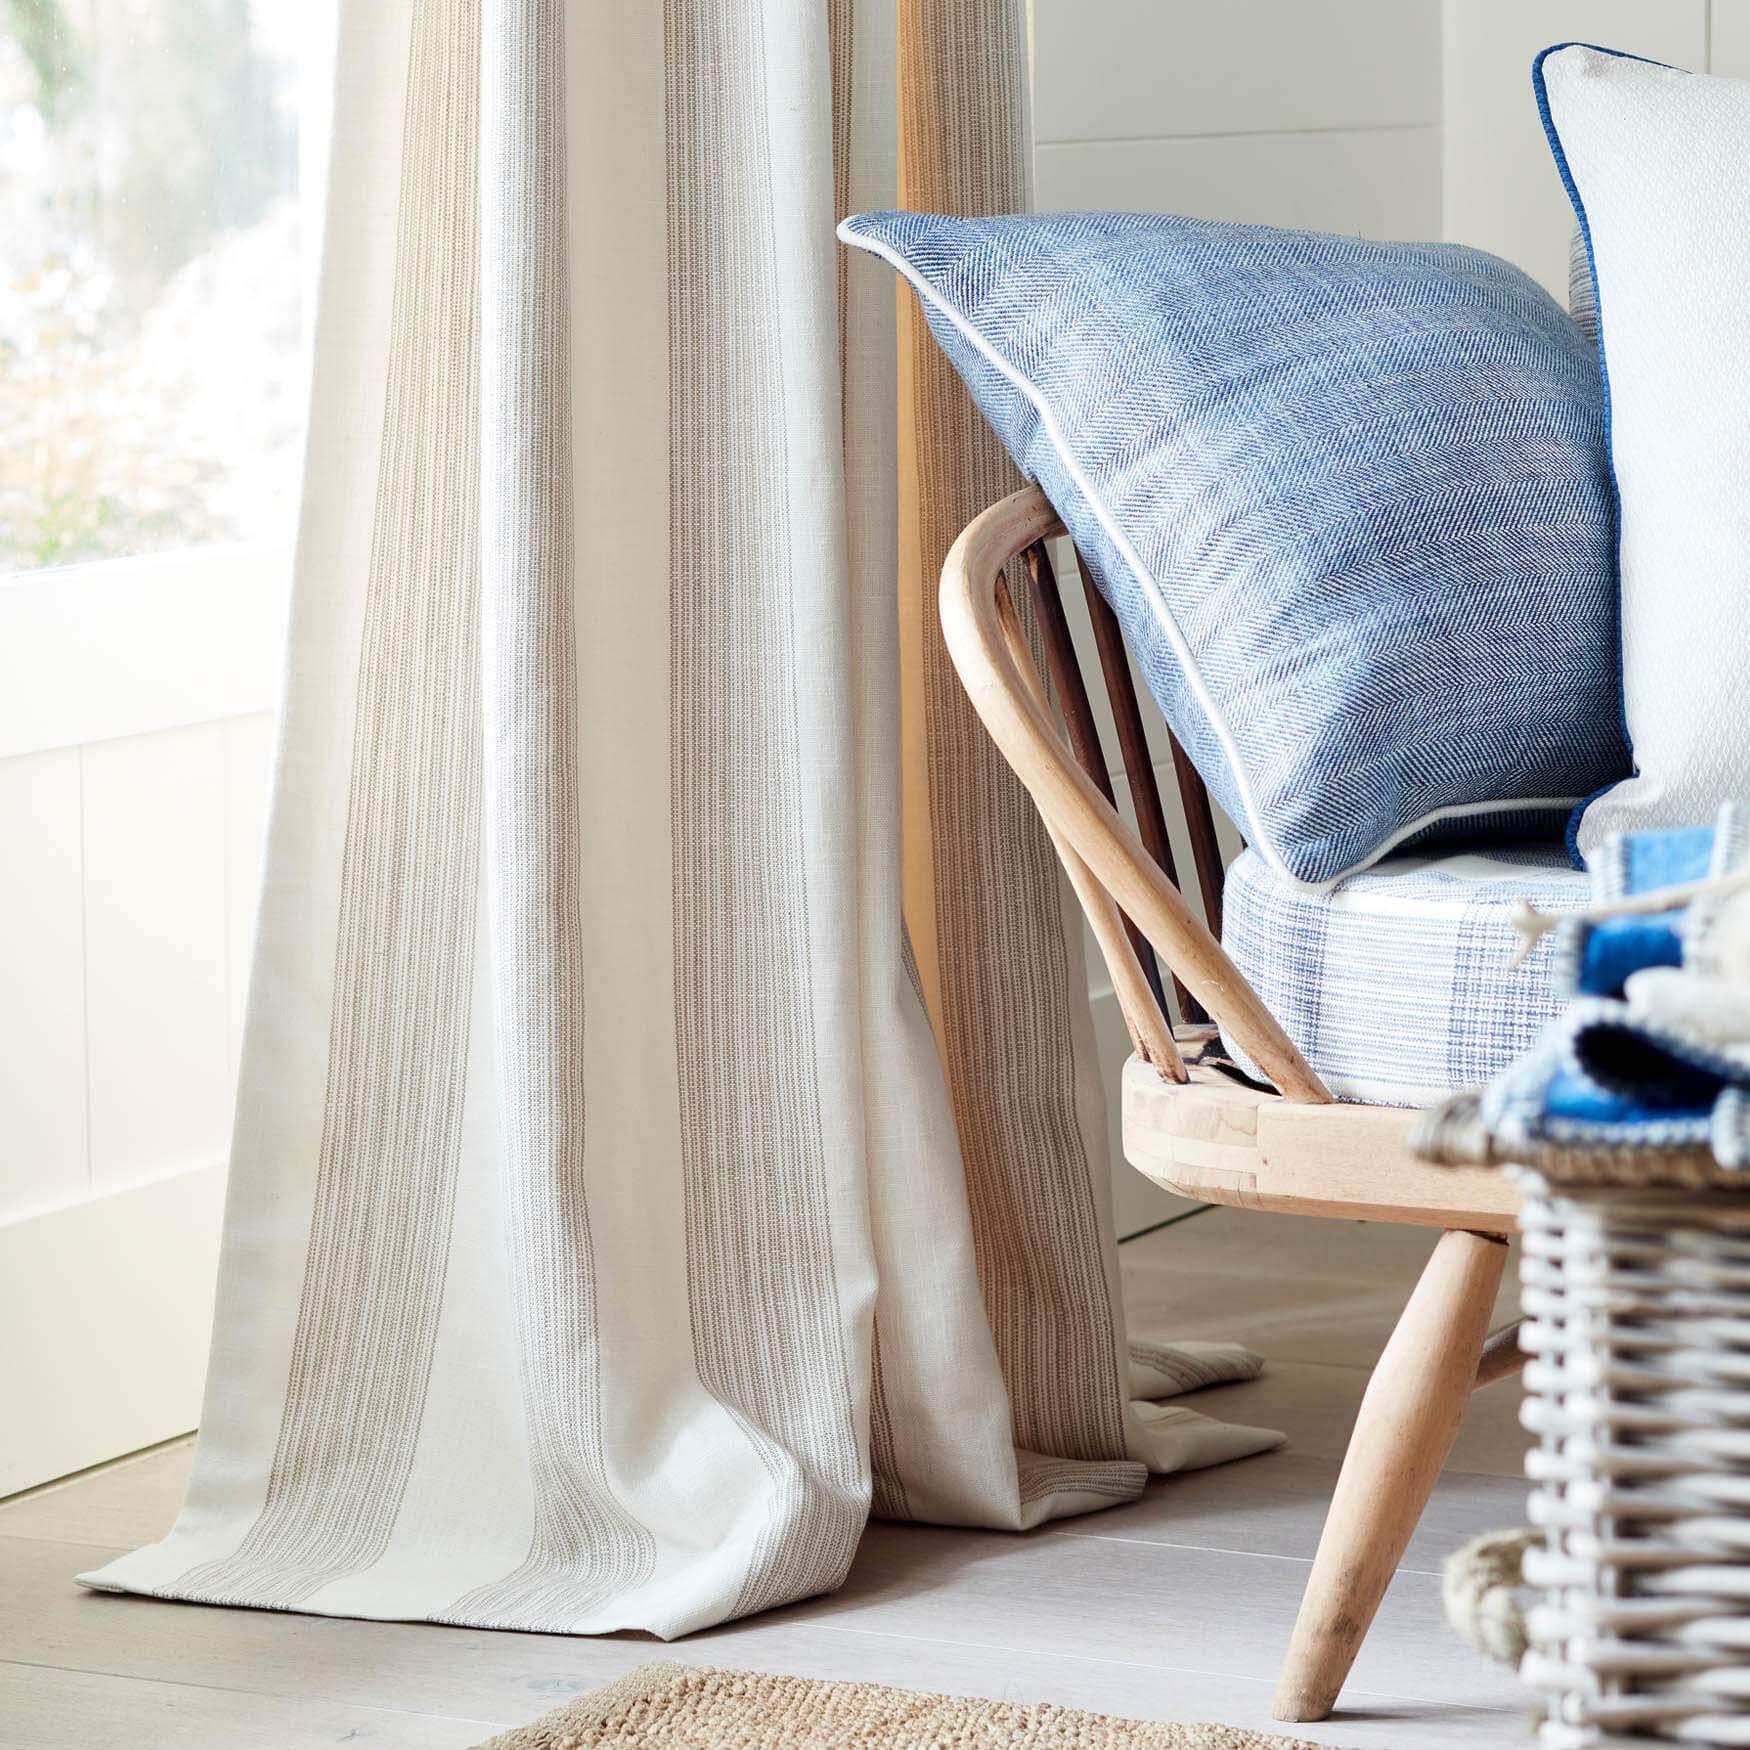 ian-mankin-curtains.jpg